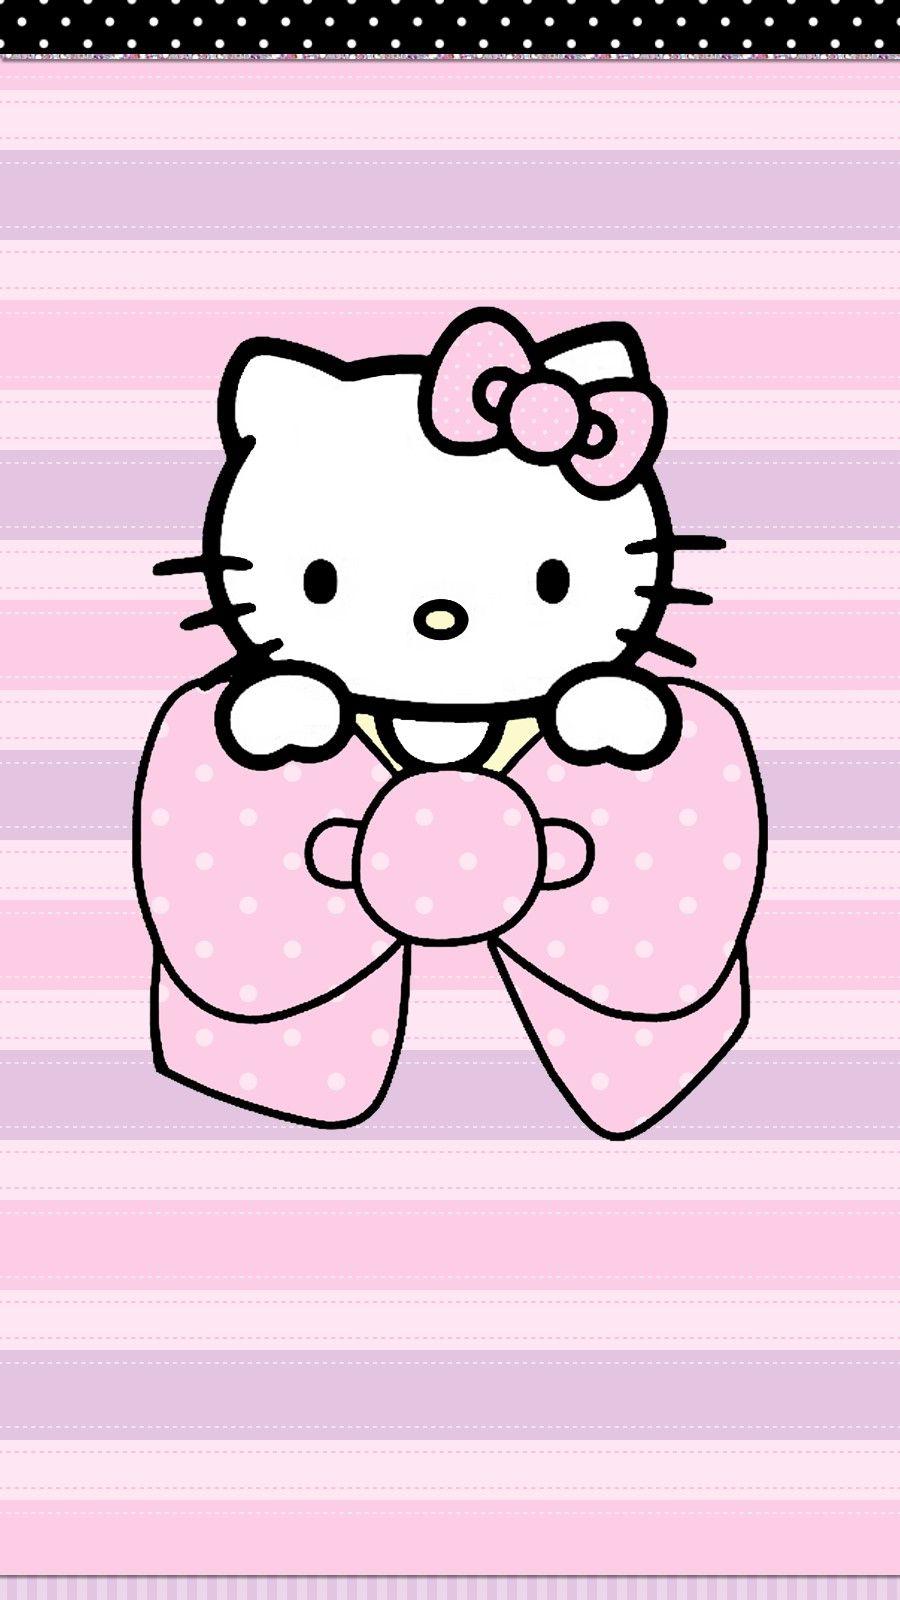 Pin By Keny H F On Cute Wallz Hello Kitty Pictures Walpaper Hello Kitty Hello Kitty Backgrounds